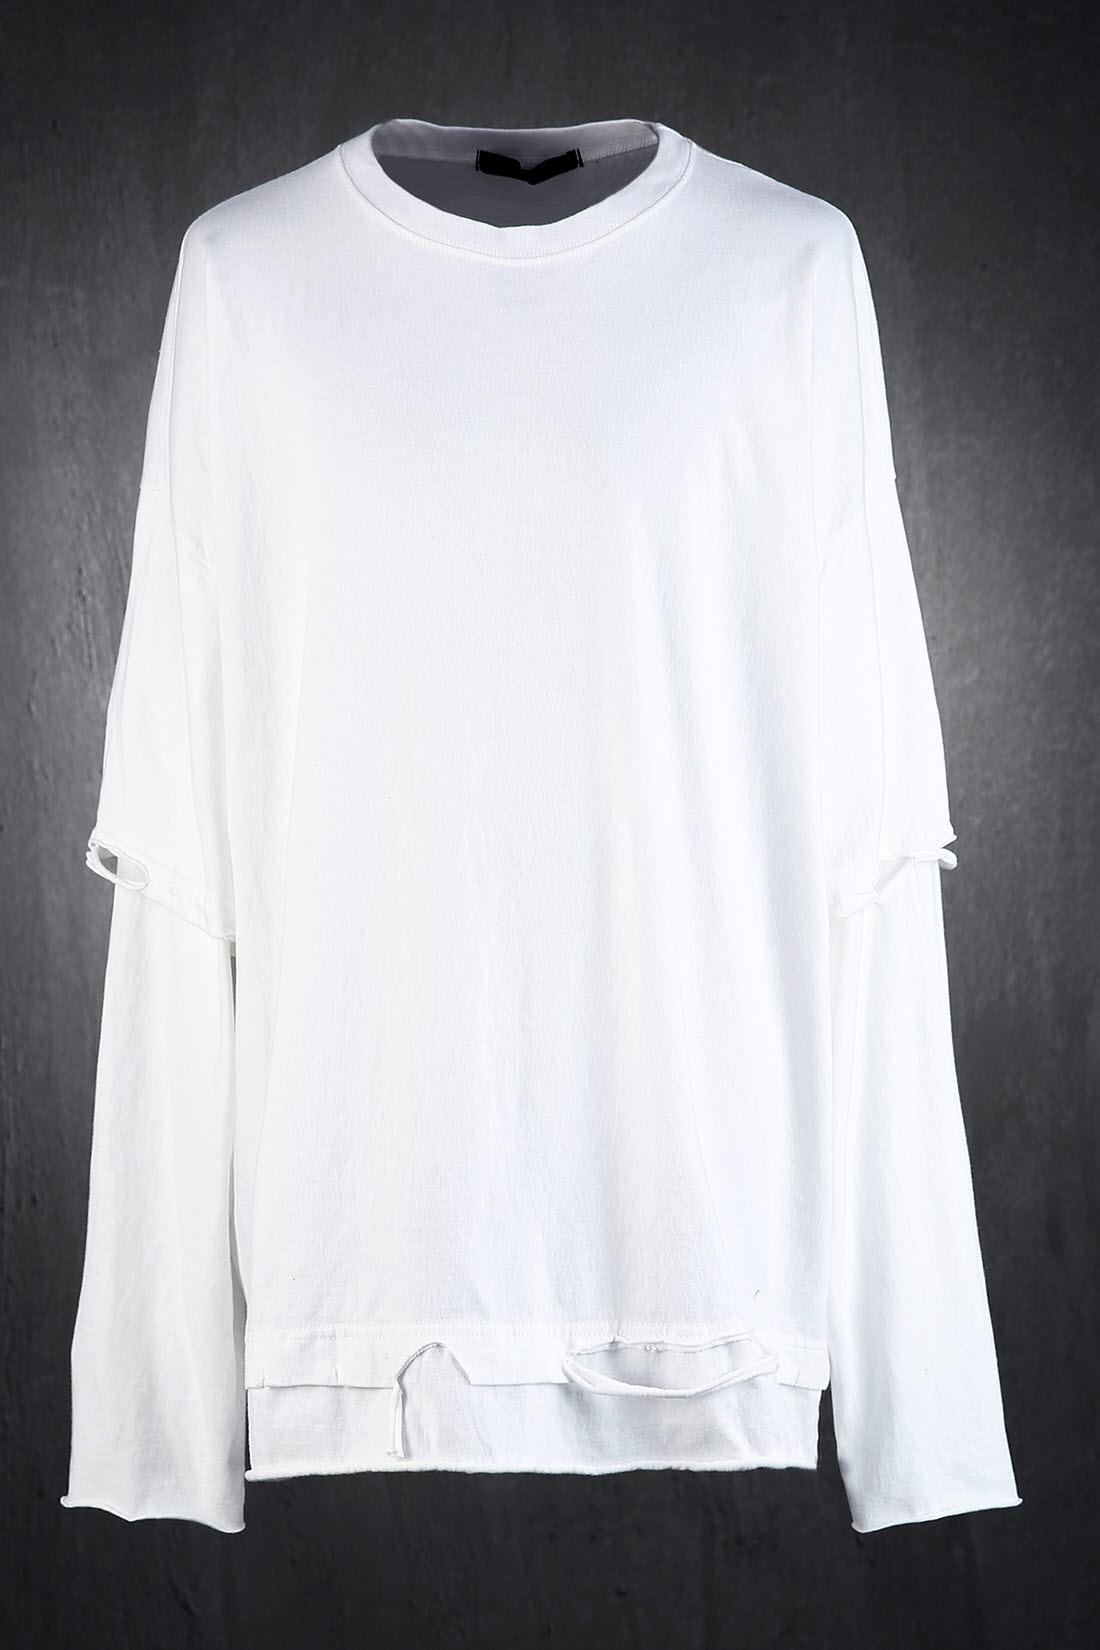 ByTheR Mens Basic Comfy Stylish Trendy Fashion Henley-neck Long Sleeve T-Shirts